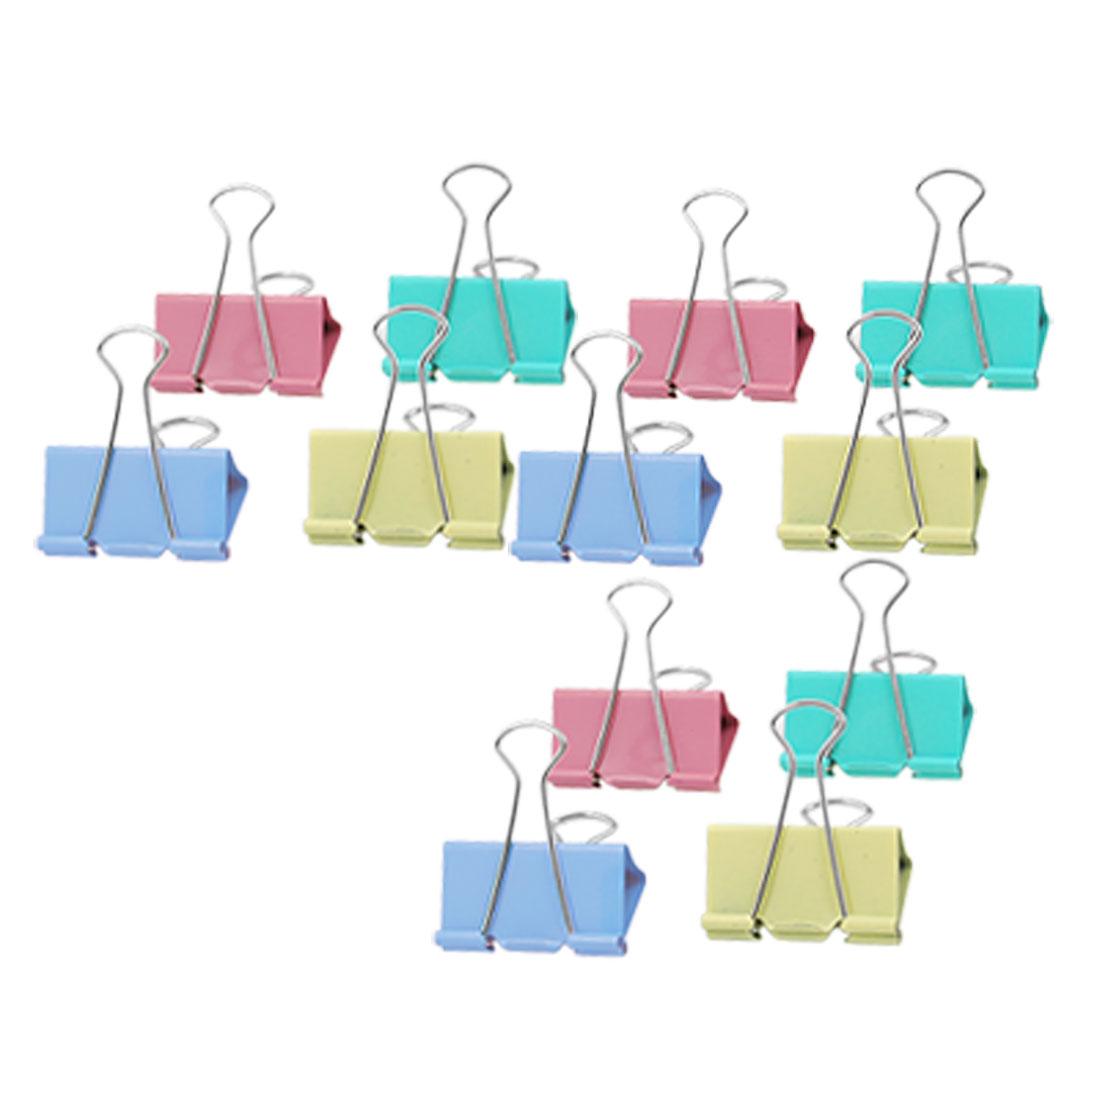 12pcs Pack Four Colors Office Paper Metal Binder Clips 50mm